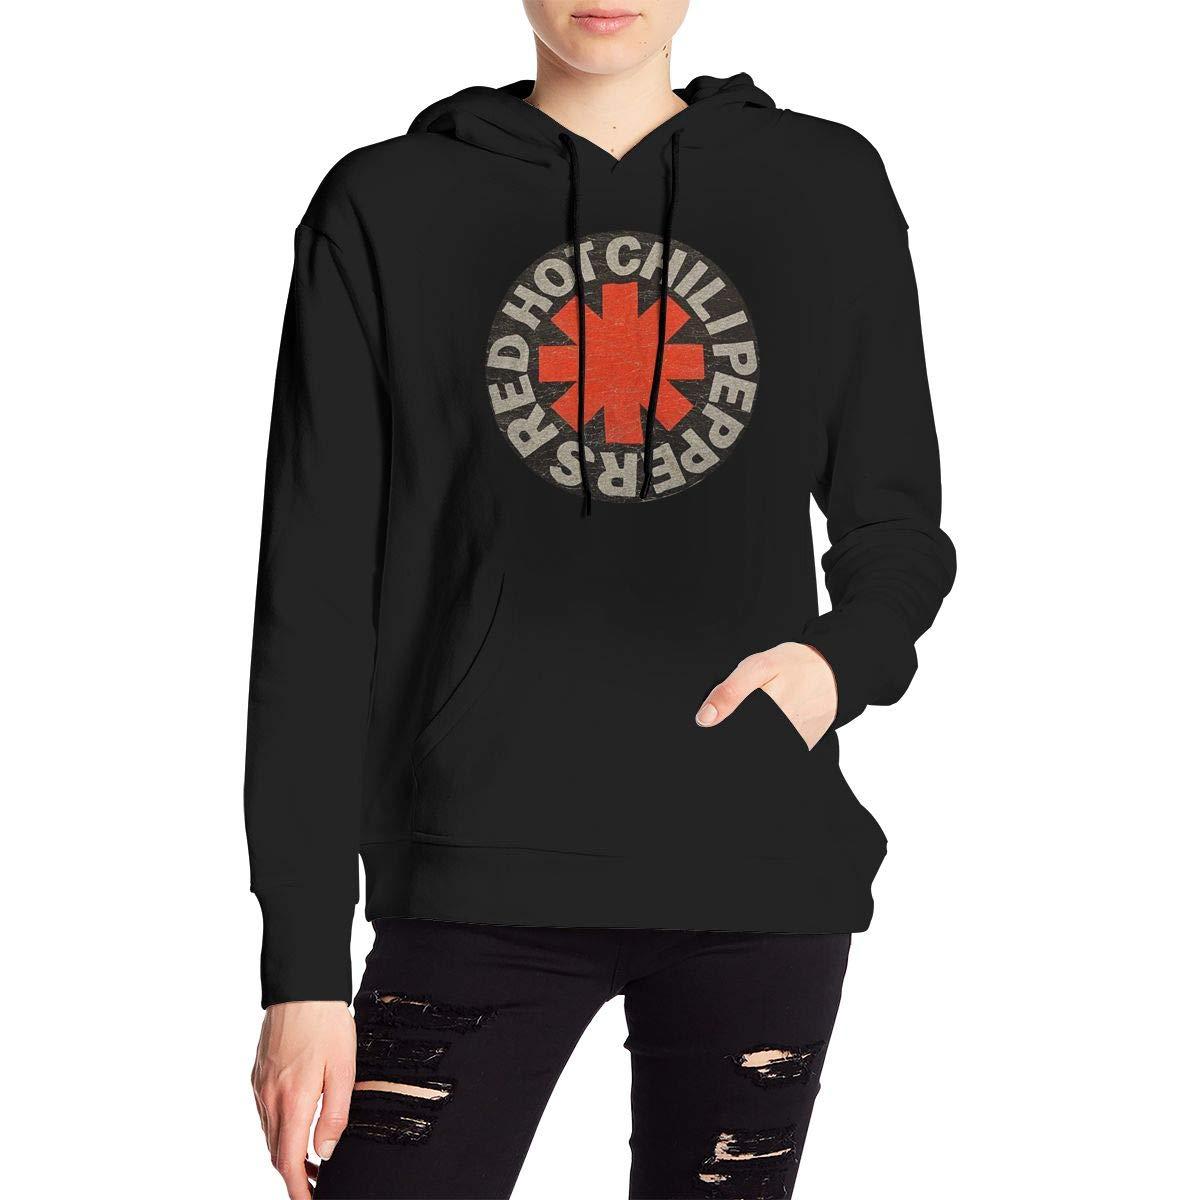 AIDANHAR Girl Custom Red Hot Chili Peppers with Hood Classic Sweatshirt Black